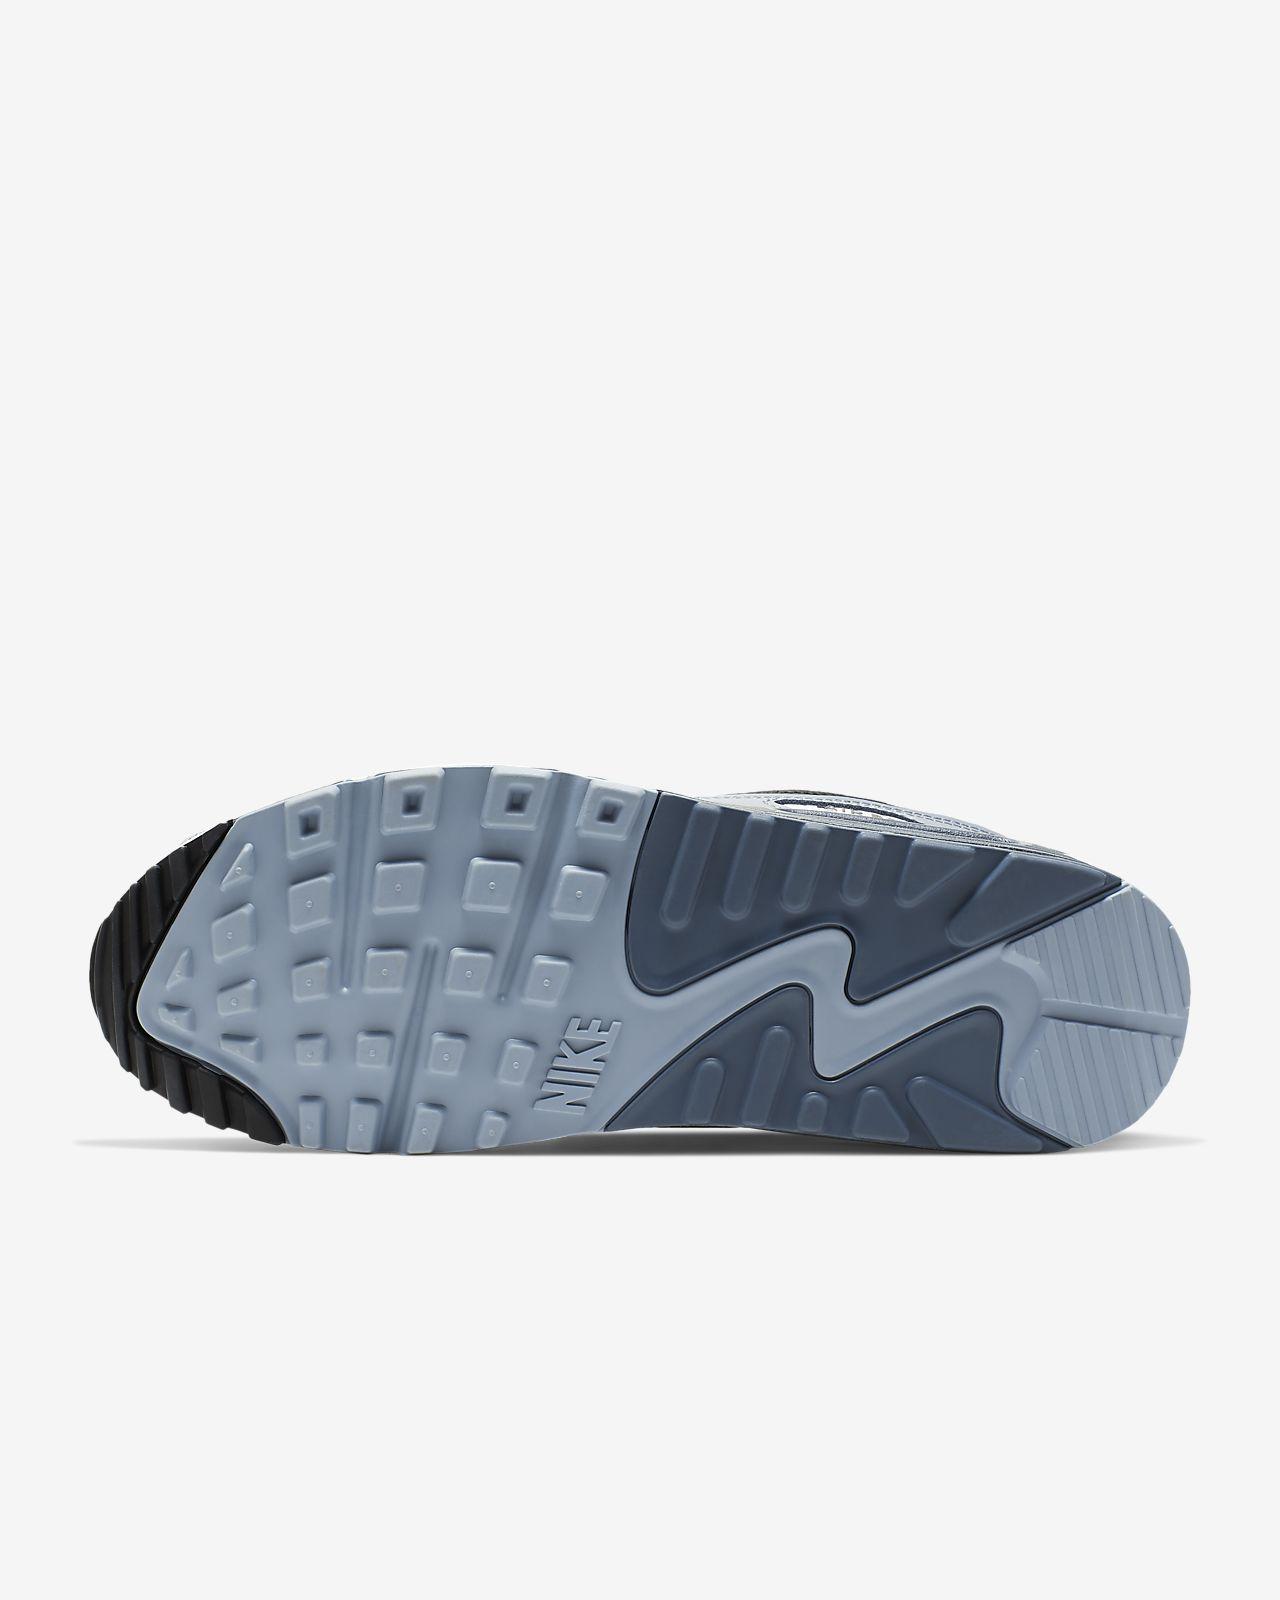 meet 28ef0 ee051 Scarpa Nike Air Max 90 Essential - Uomo. Nike.com IT